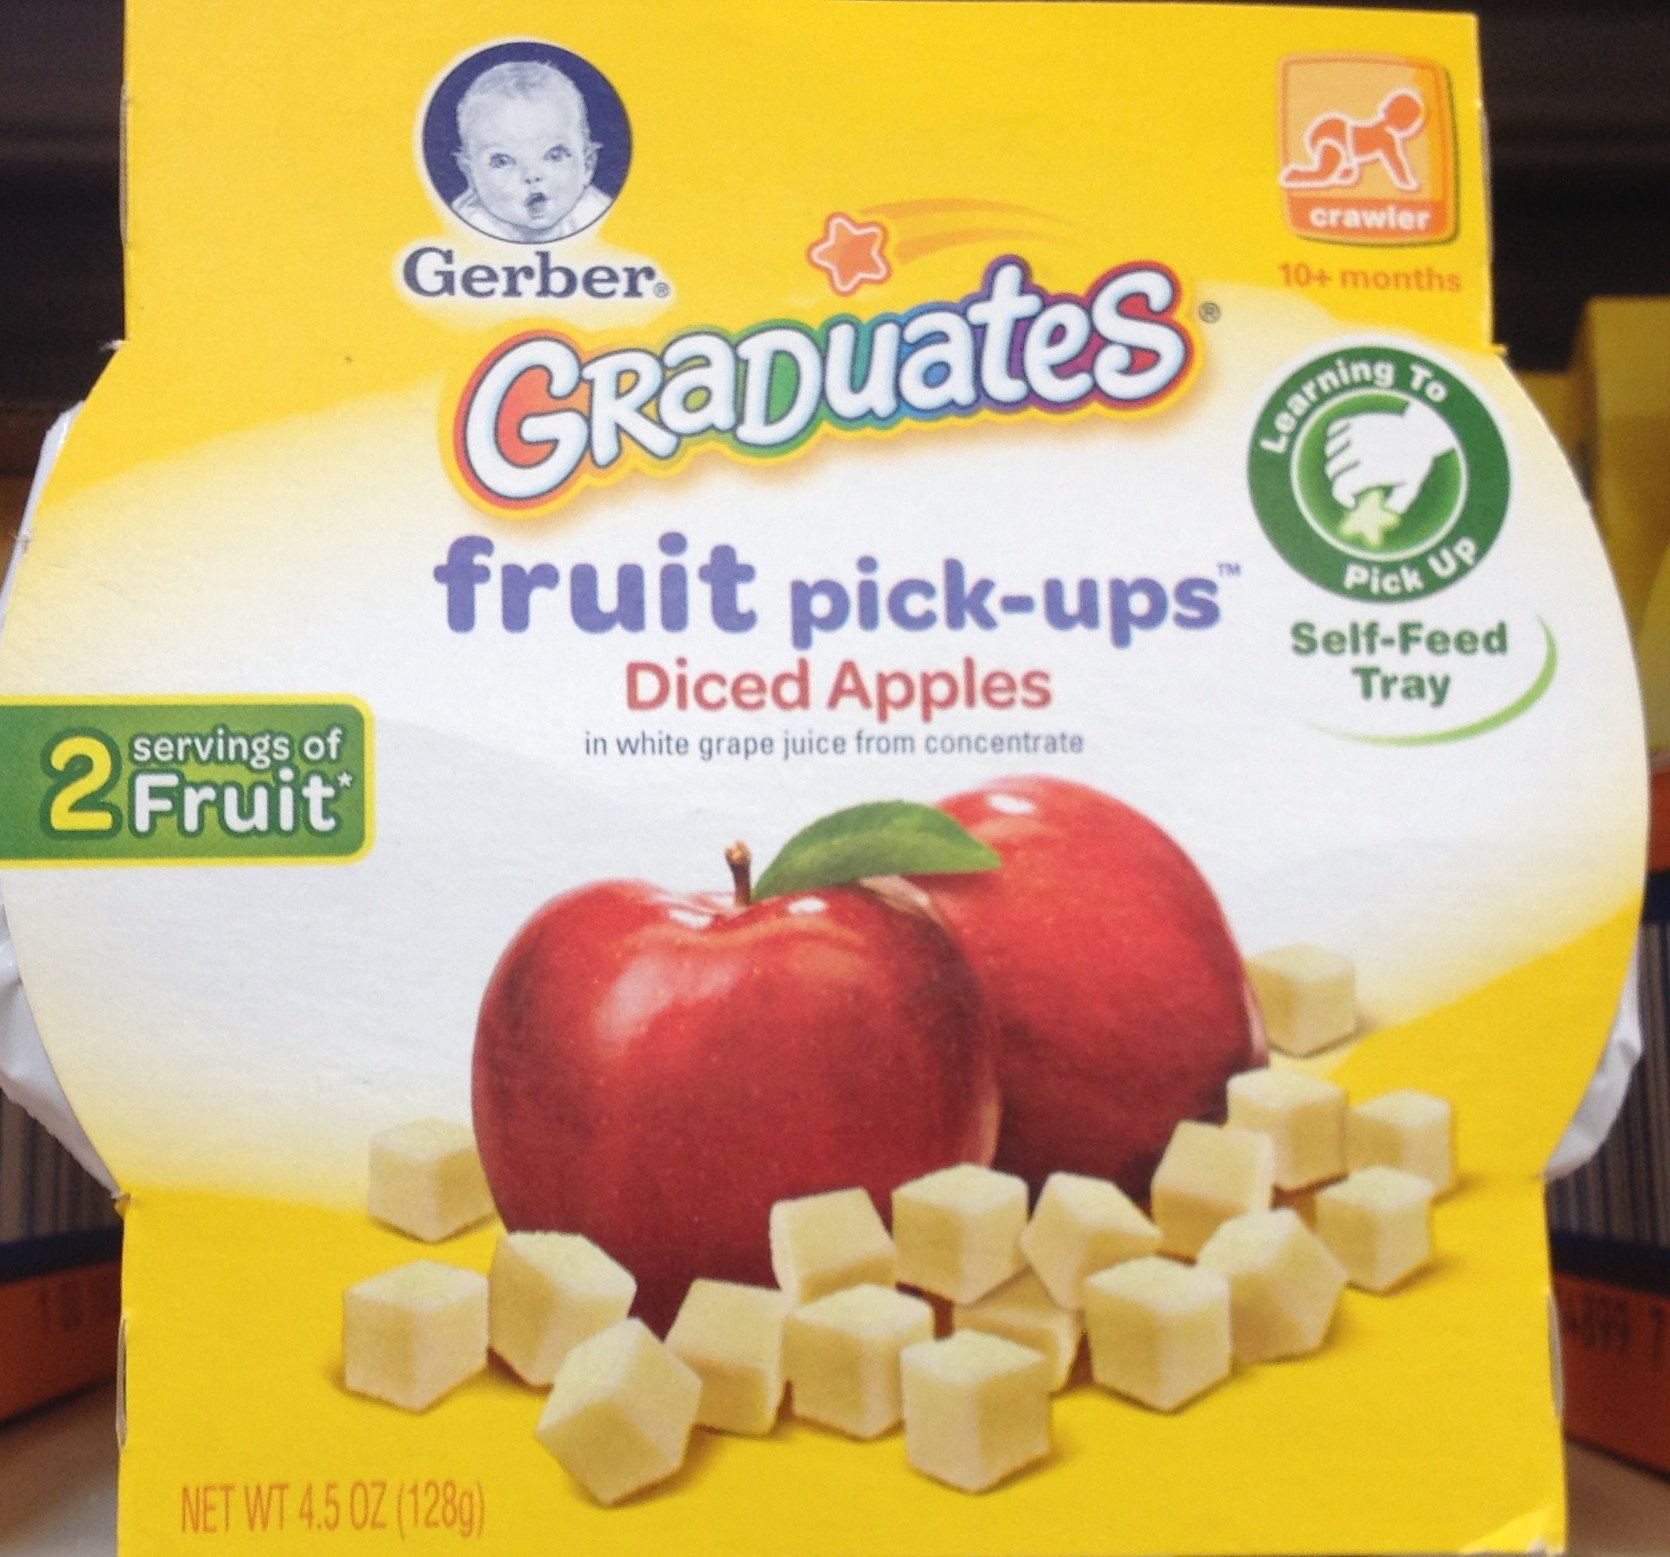 Gerber Graduates Fruit Pick-Ups DICED APPLES 4.5oz (Pack of 6)